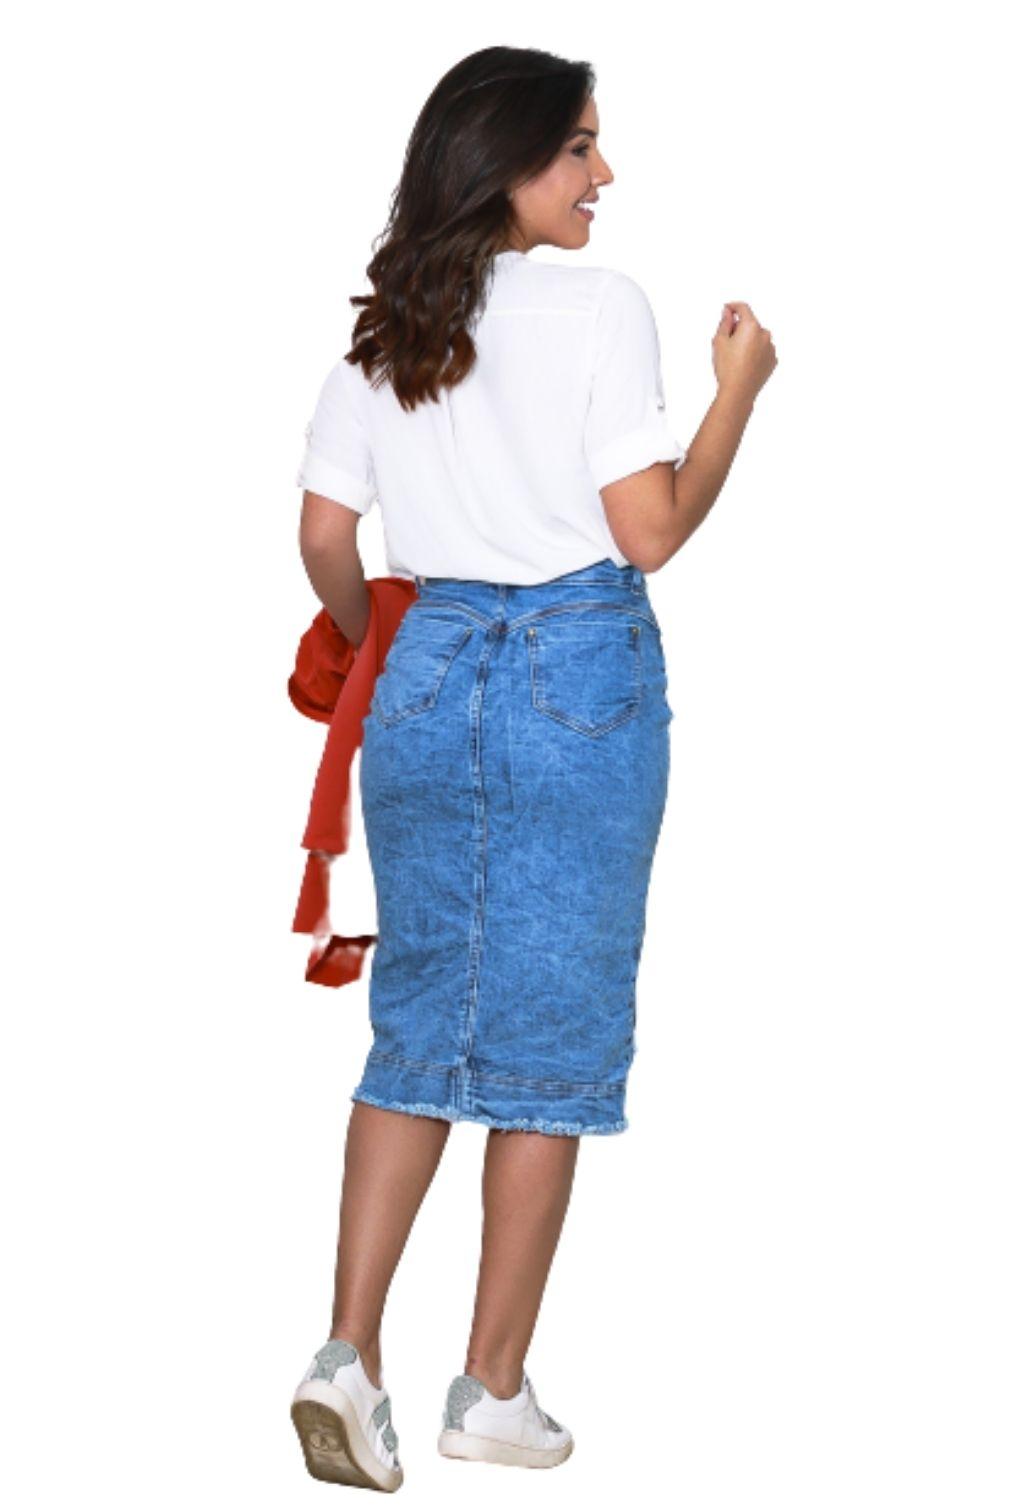 Saia Jeans Feminina Midi com Fenda e Cinto  - ModaStore   Moda Feminina